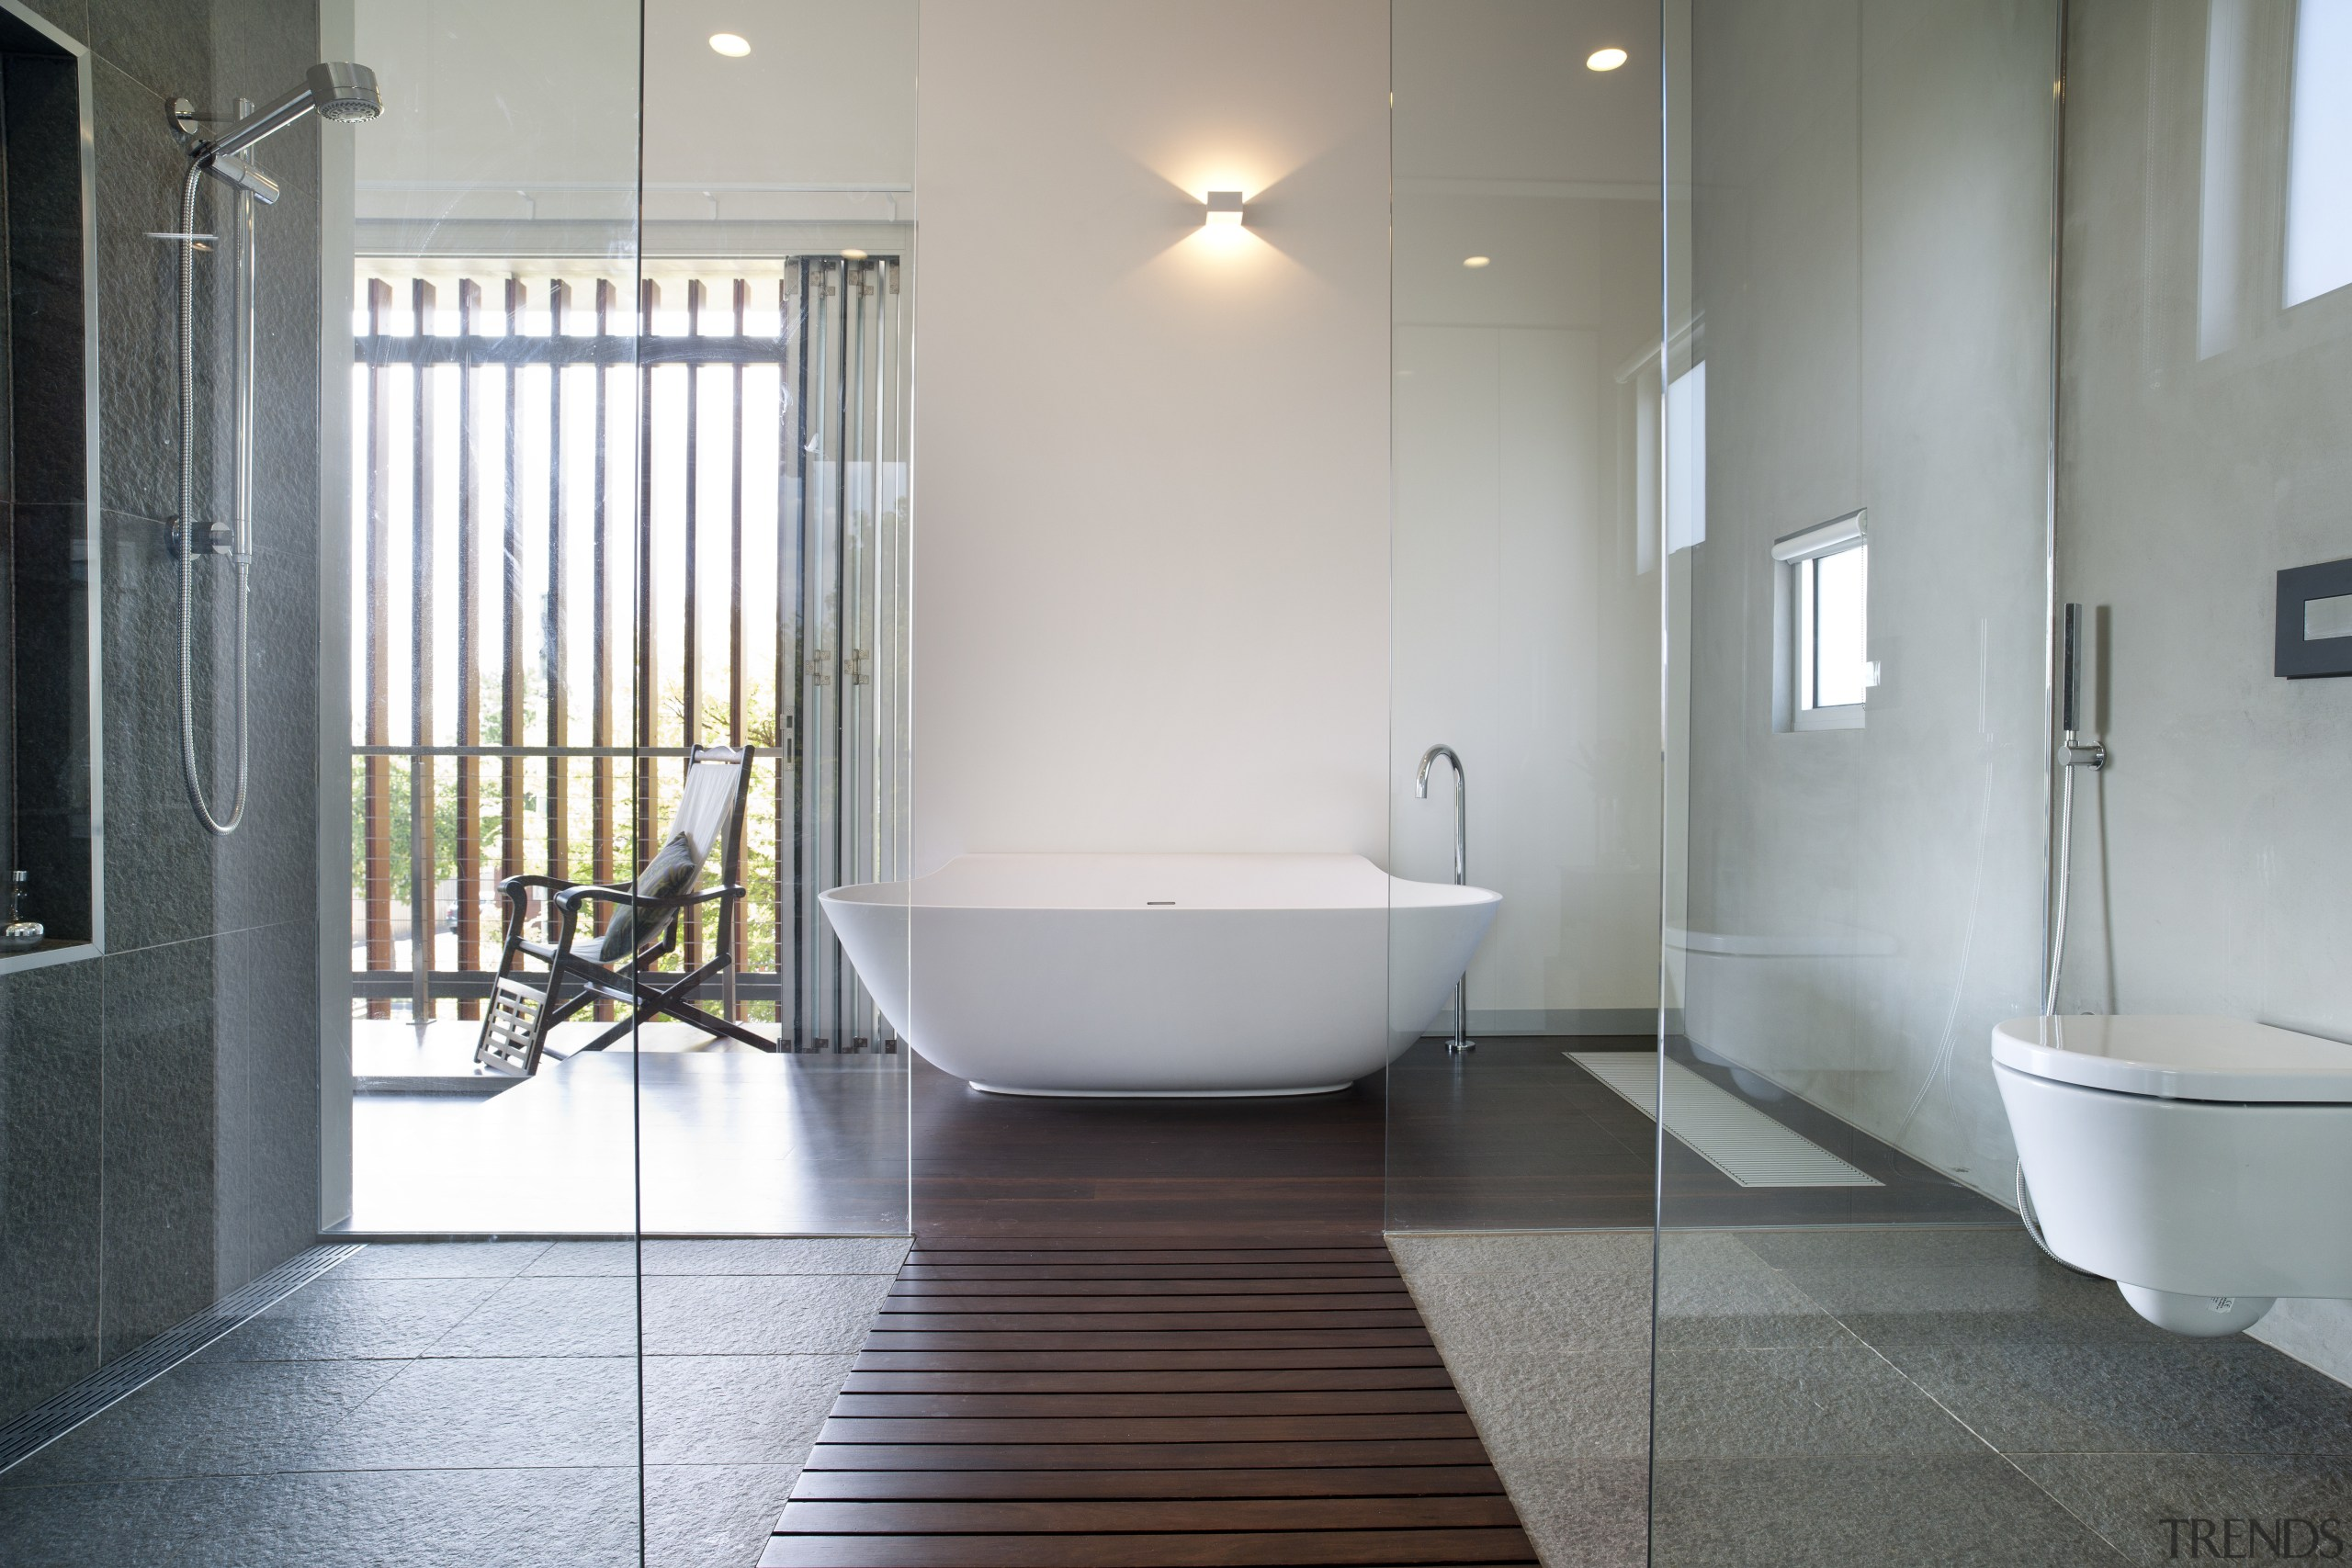 Architect Taras Wolf master bathroom - Architect Taras architecture, bathroom, daylighting, floor, flooring, home, interior design, plumbing fixture, property, real estate, room, tile, gray